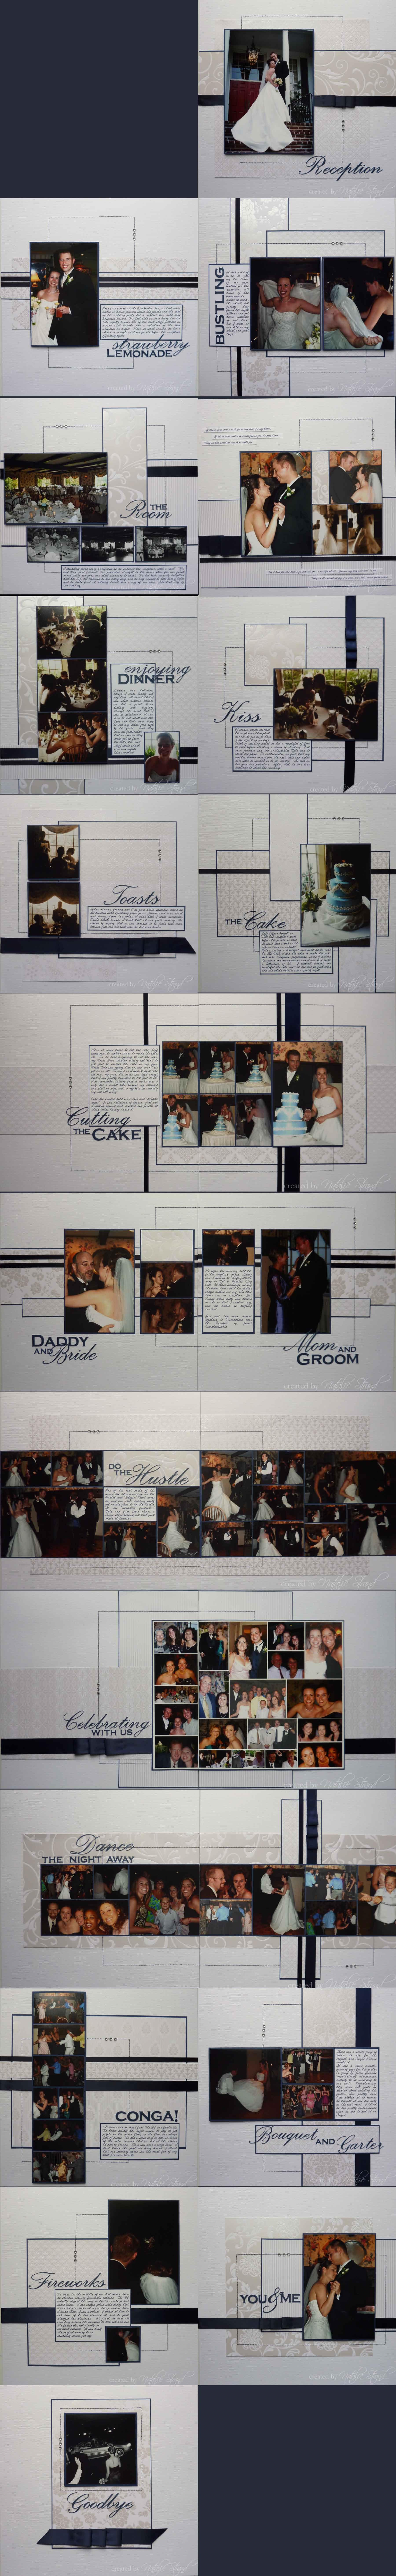 Wedding scrapbook ideas layouts - All